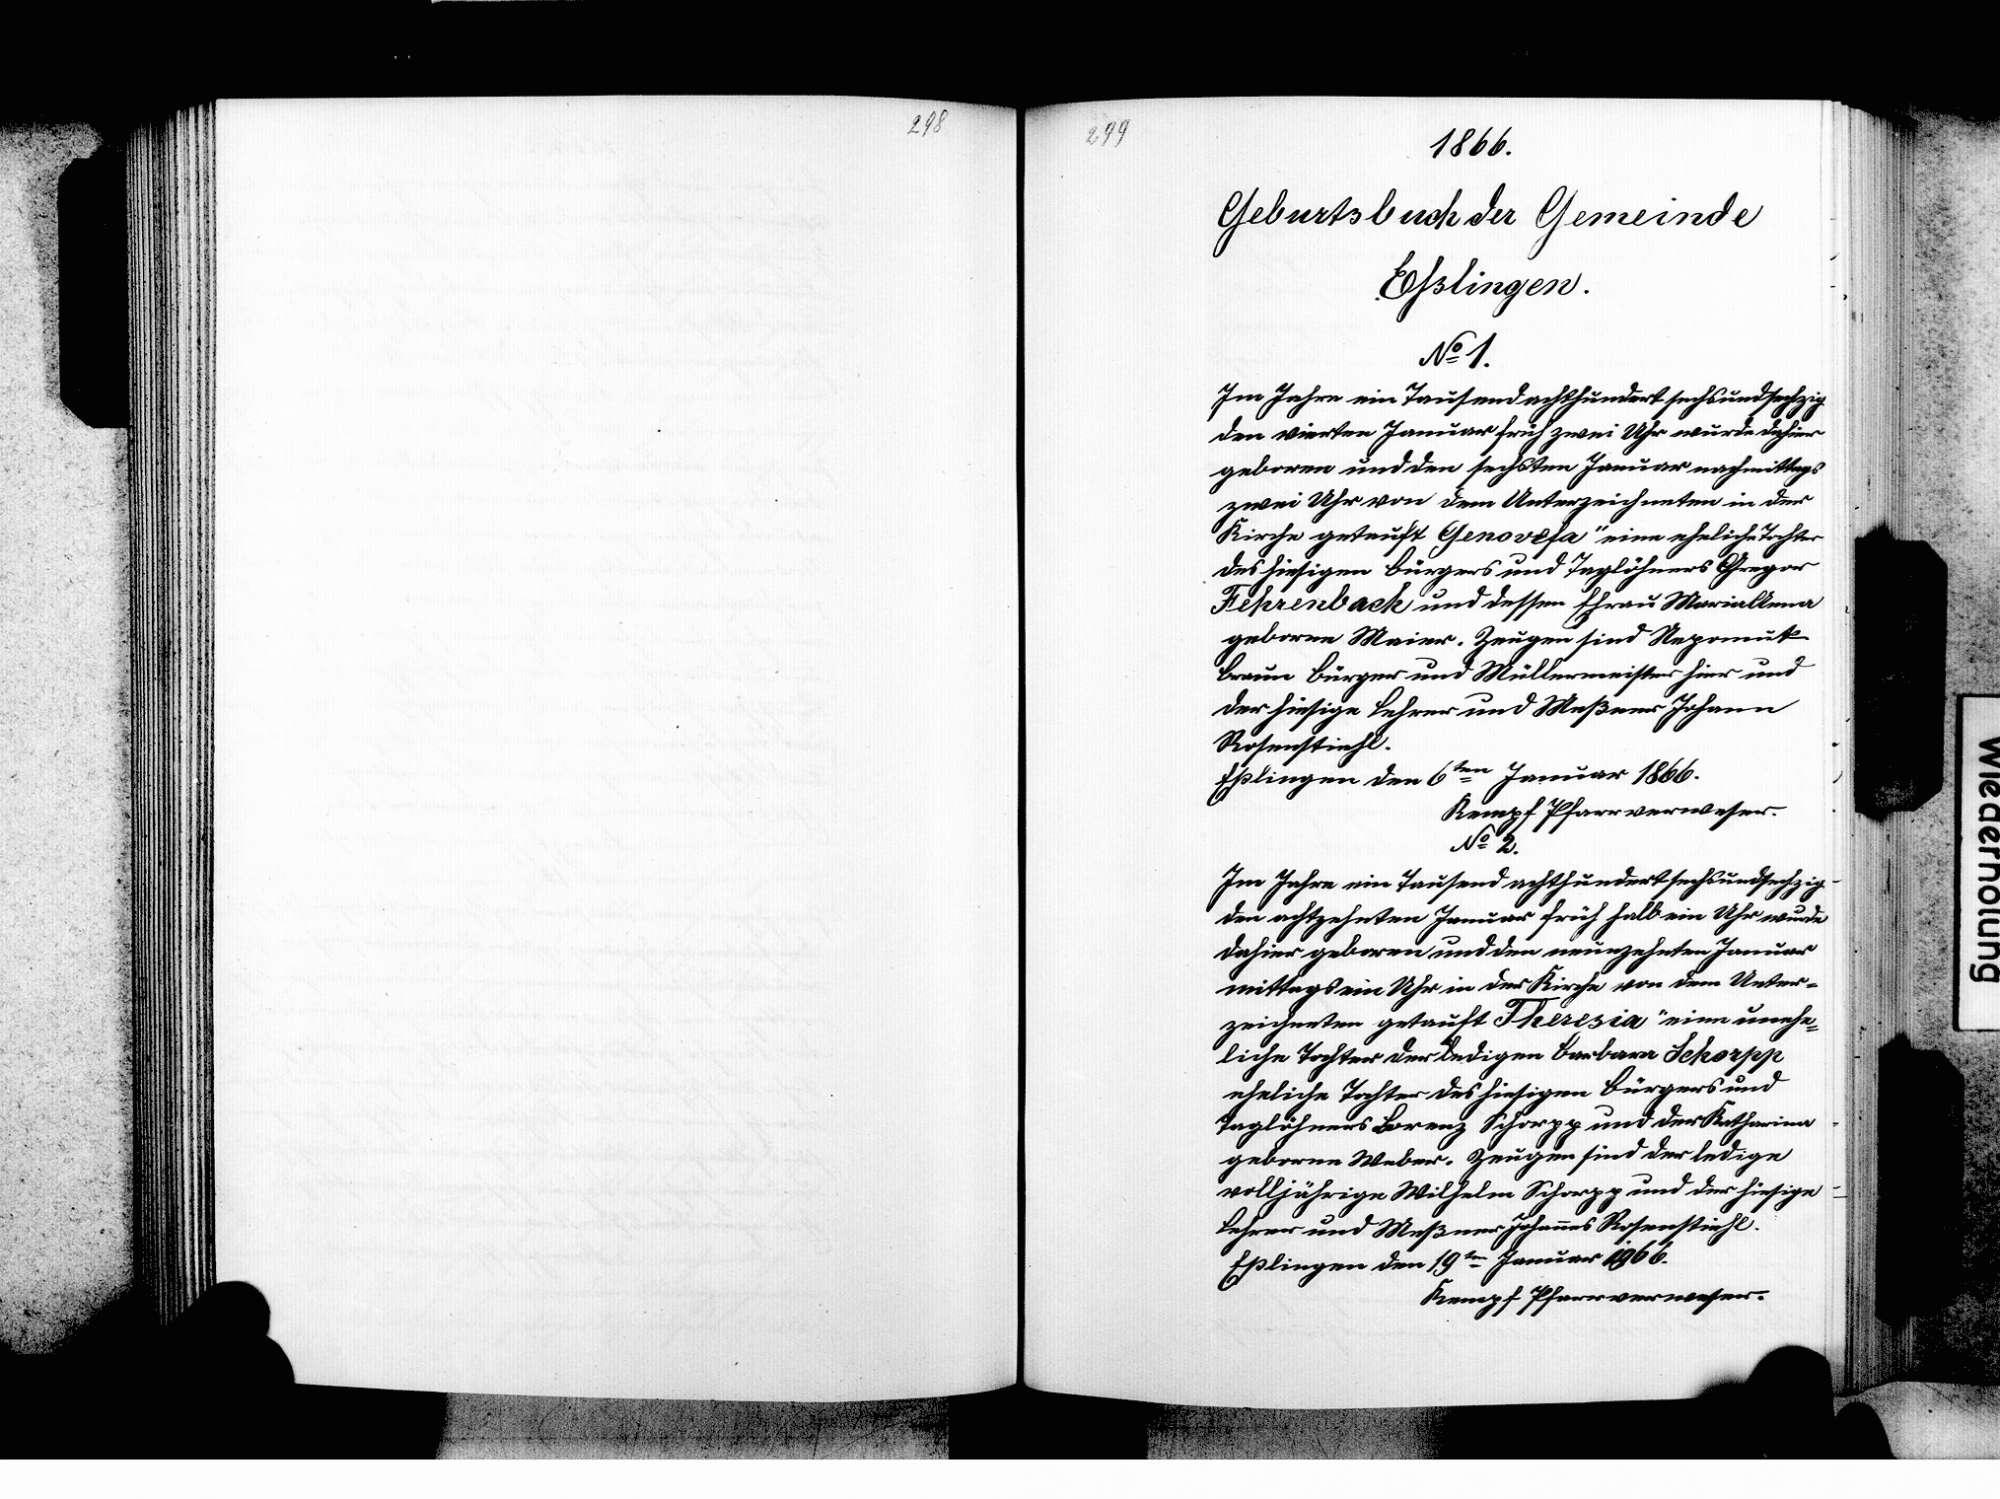 Eßlingen, Tuttlingen TUT; Katholische Gemeinde: Standesbuch 1810-1870, Bild 2